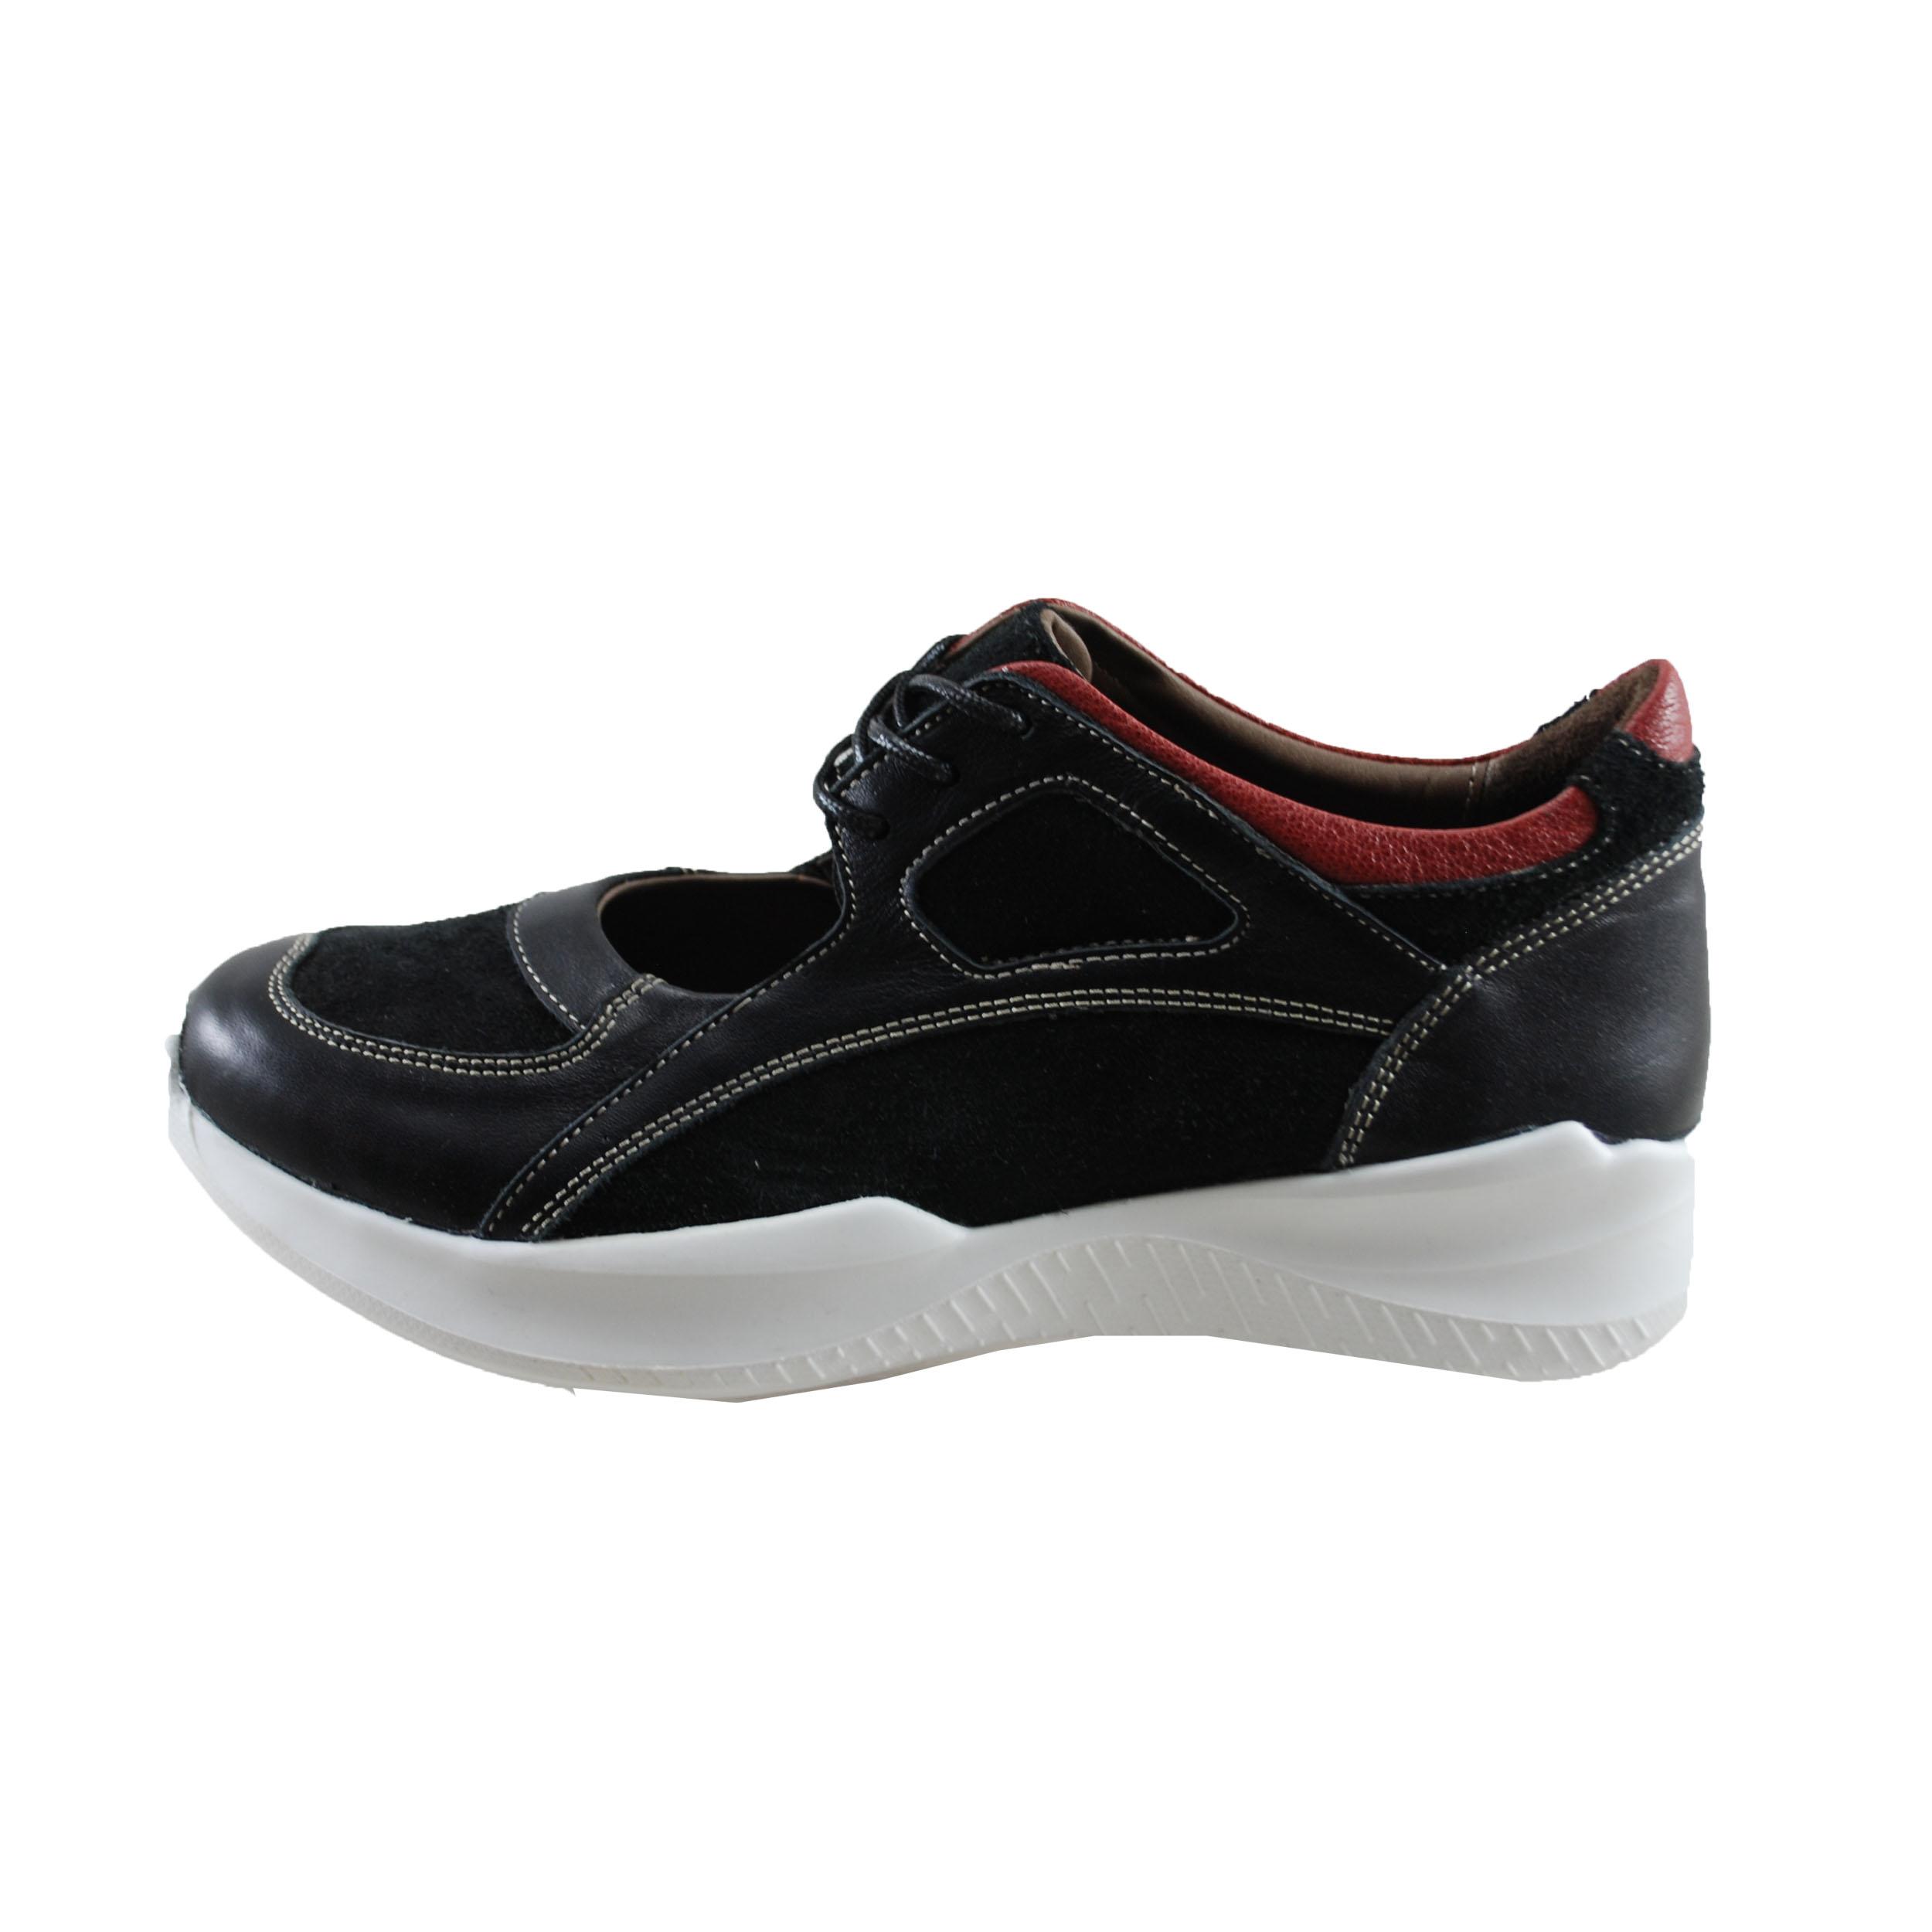 کفش روزمره زنانه  کد 584